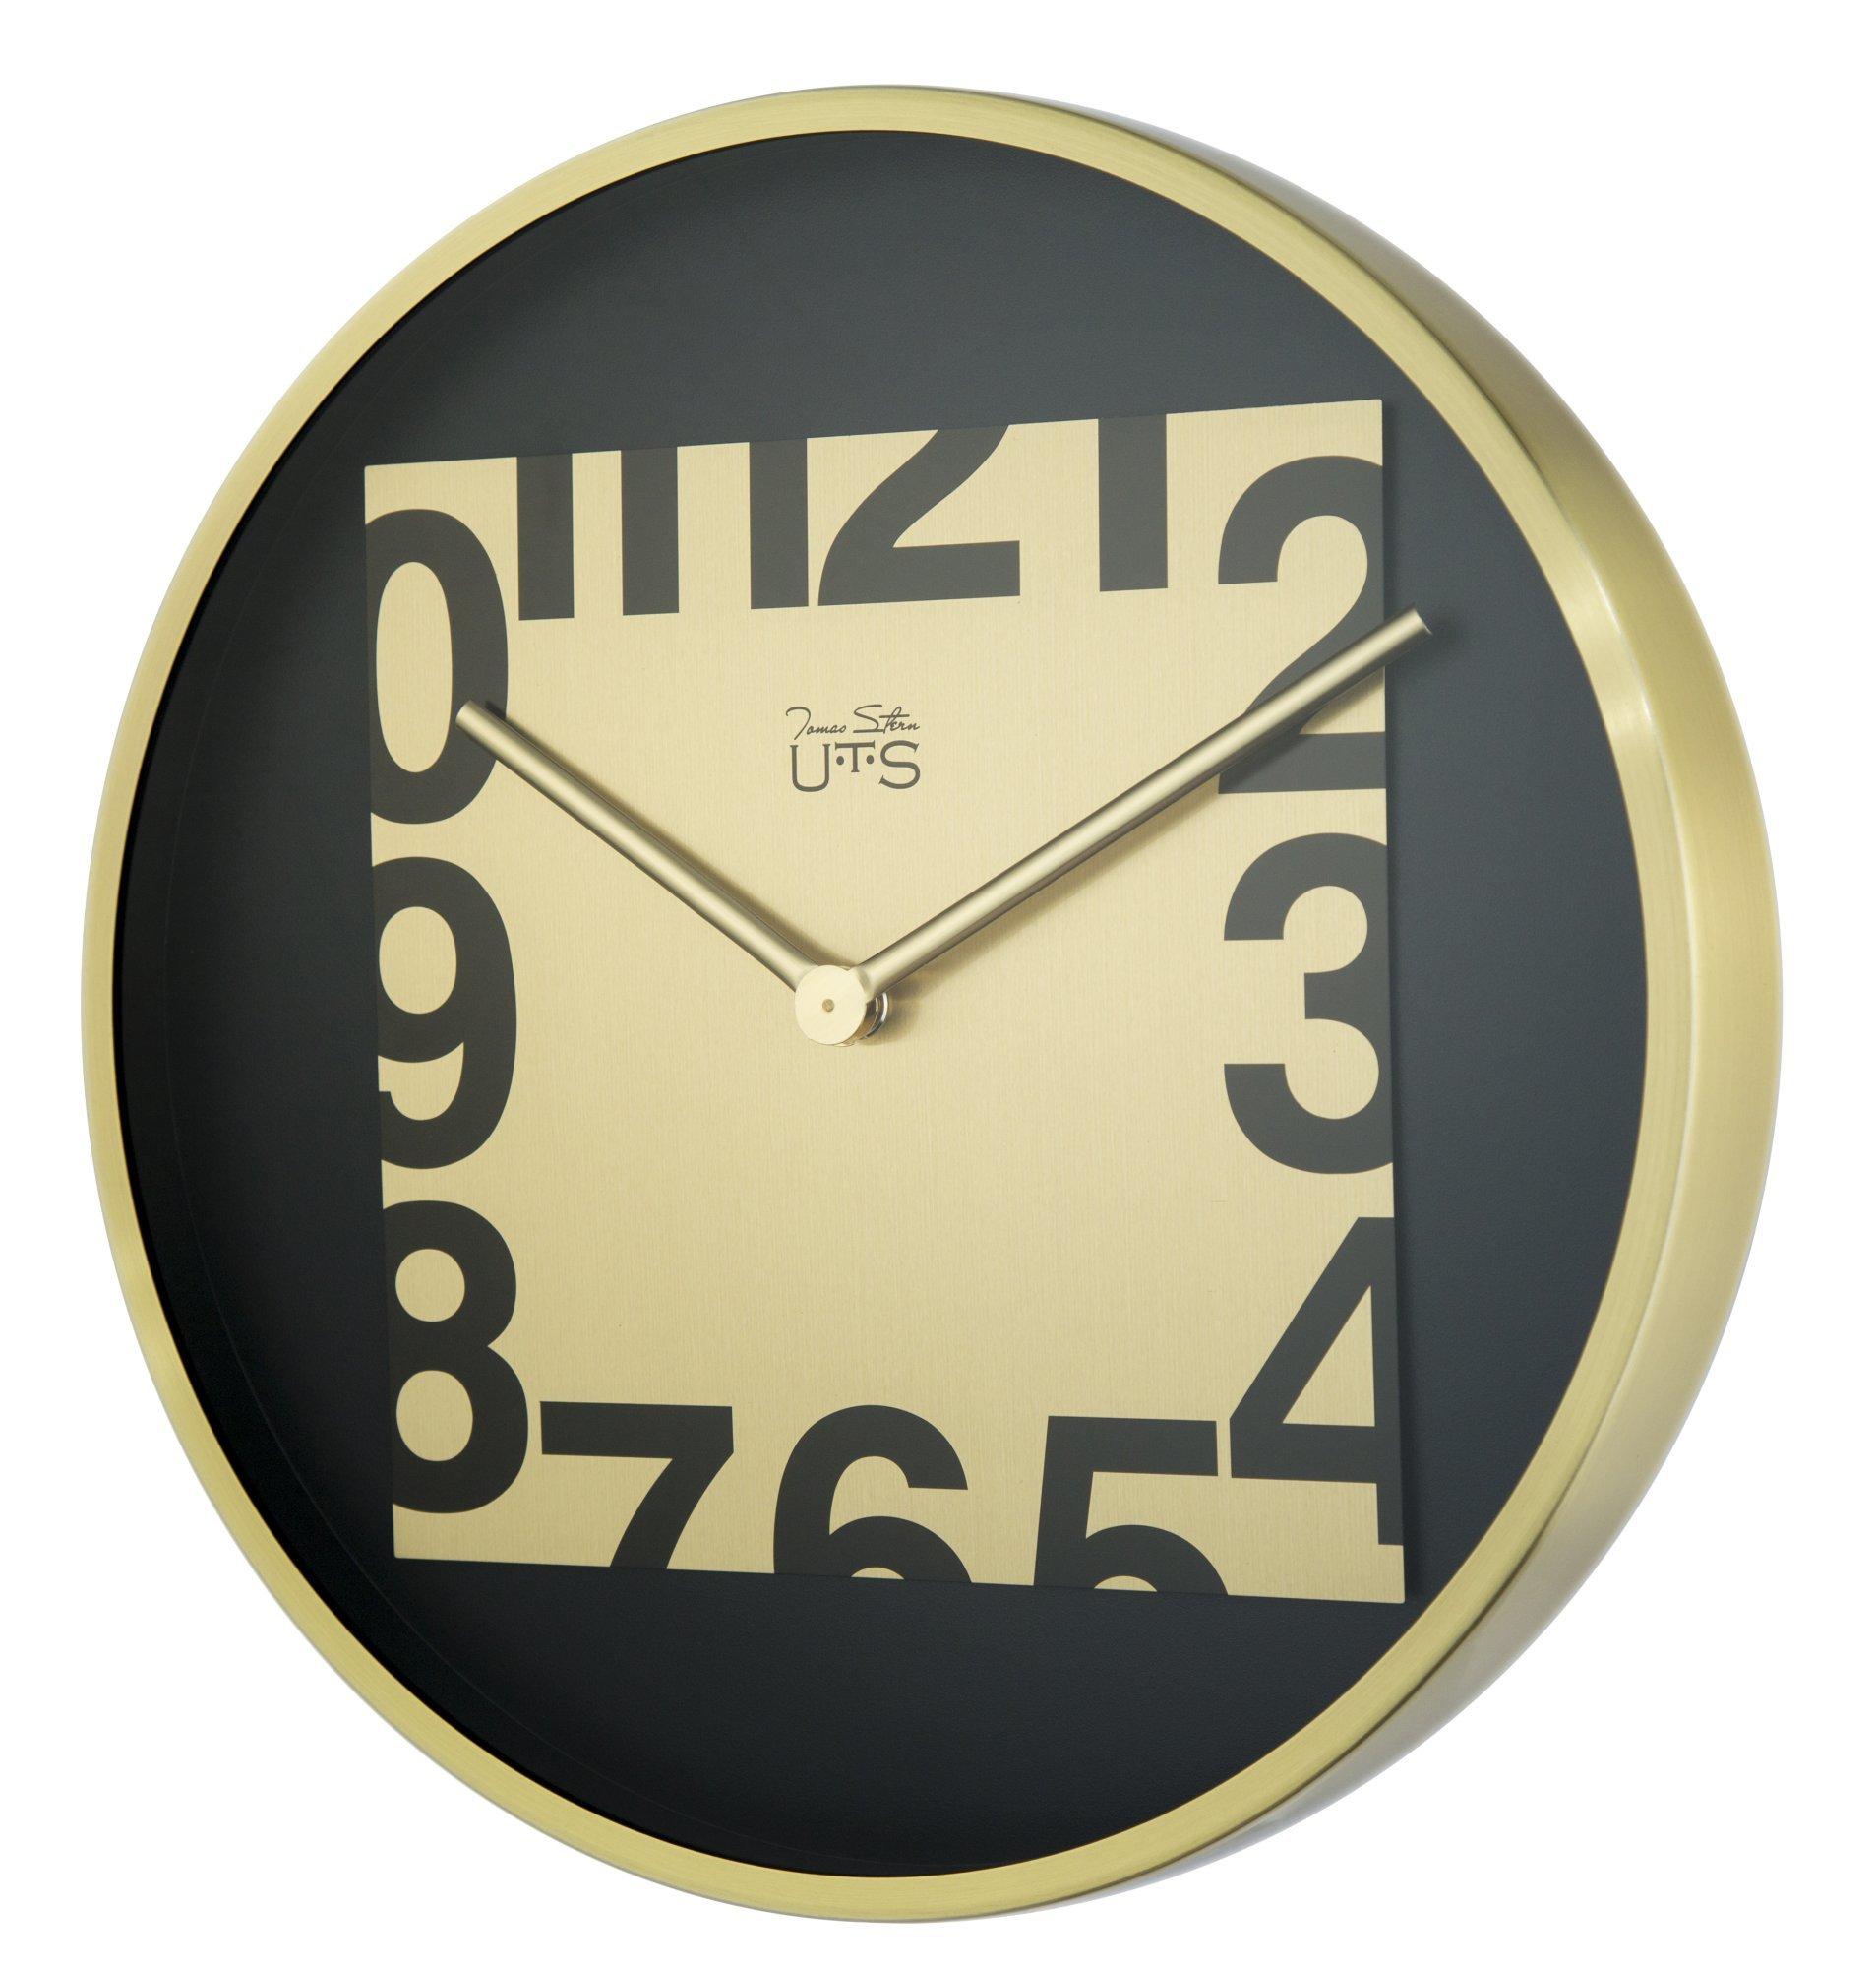 Часы настенные Часы настенные Tomas Stern 4006G chasy-nastennye-tomas-stern-4006g-germaniya.jpg